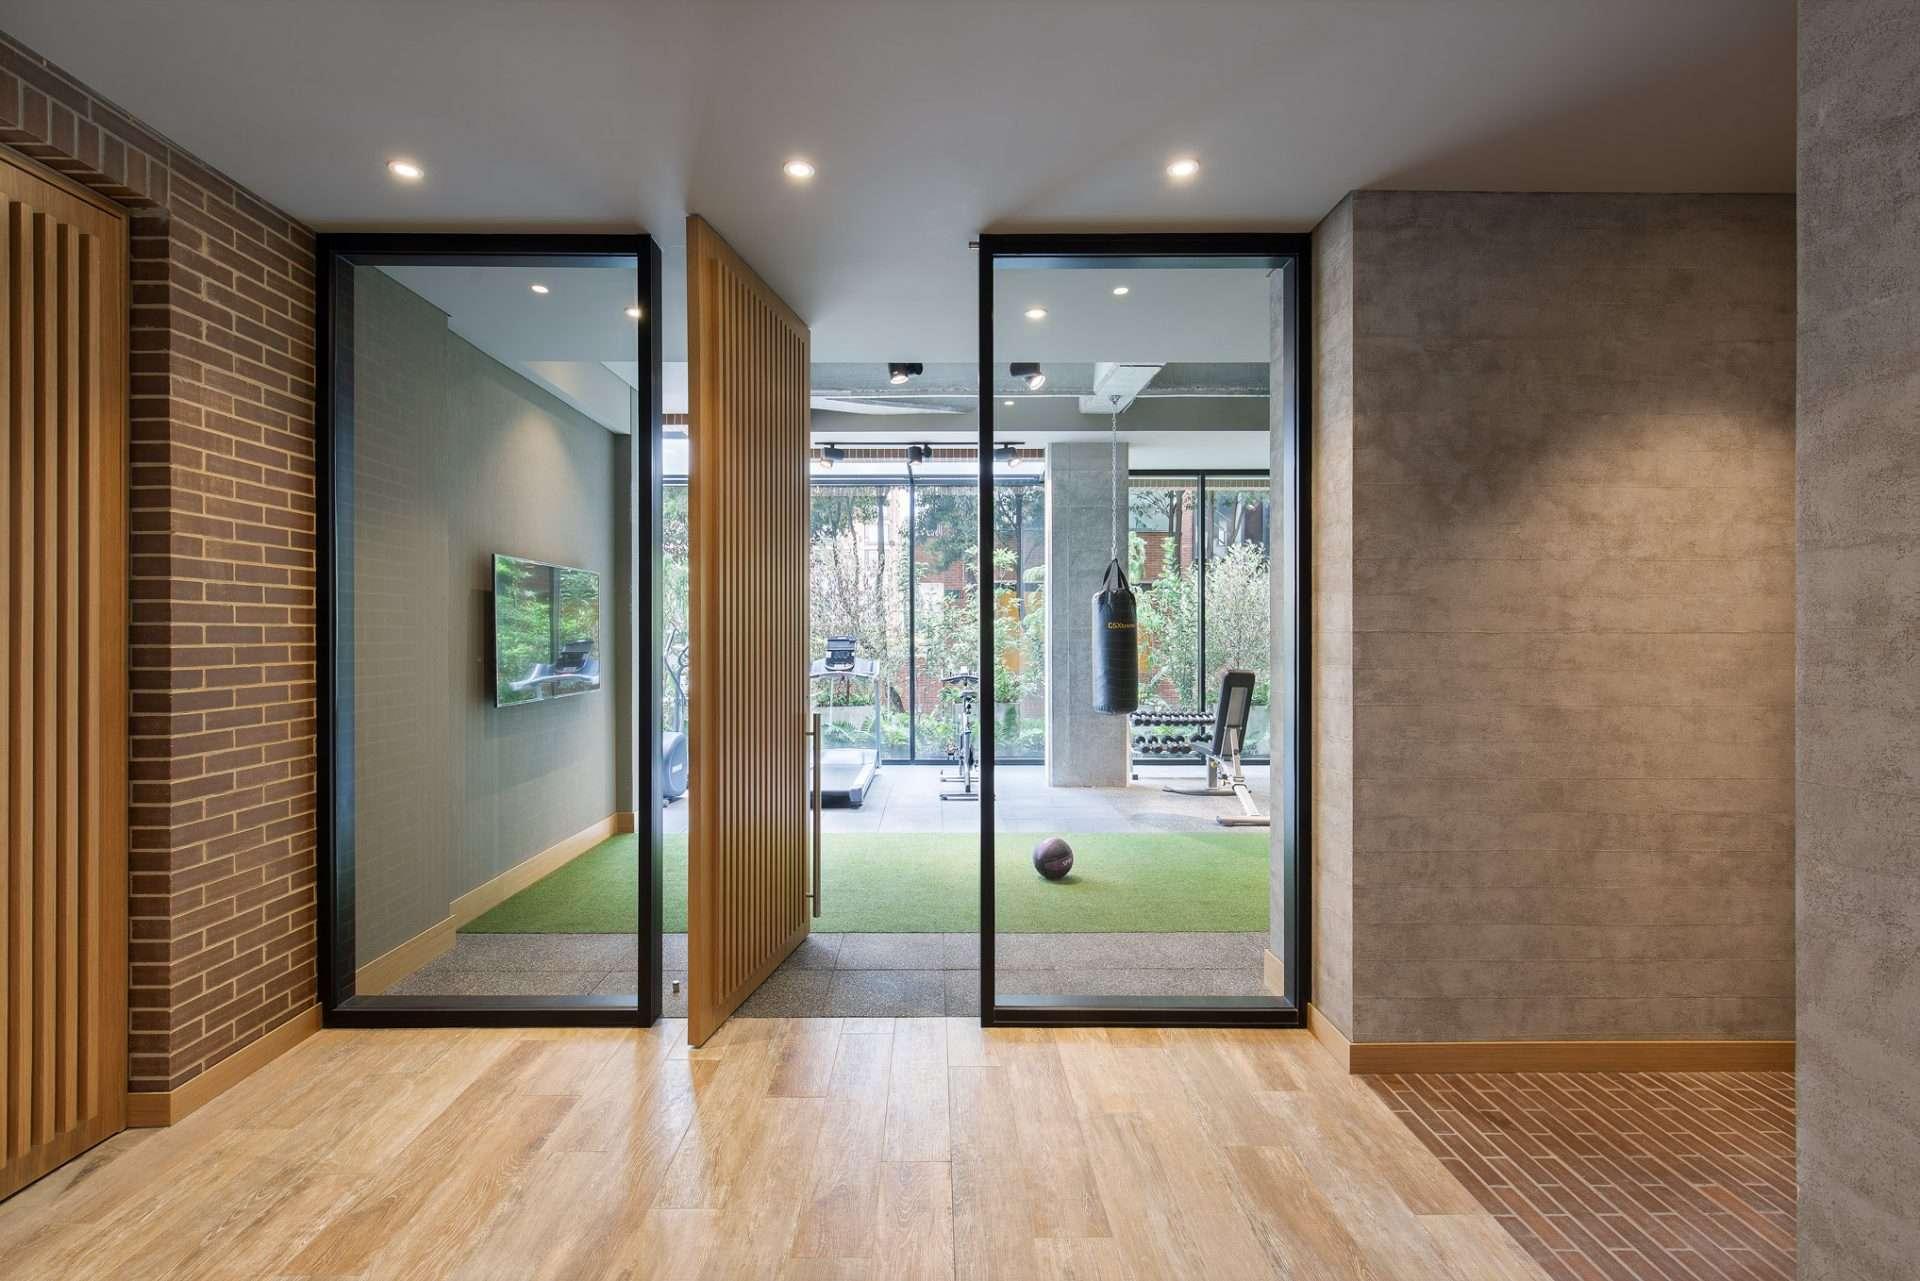 08.RLU.arquitectura.bogota.architecture.interior.simonboschphotography.virrey